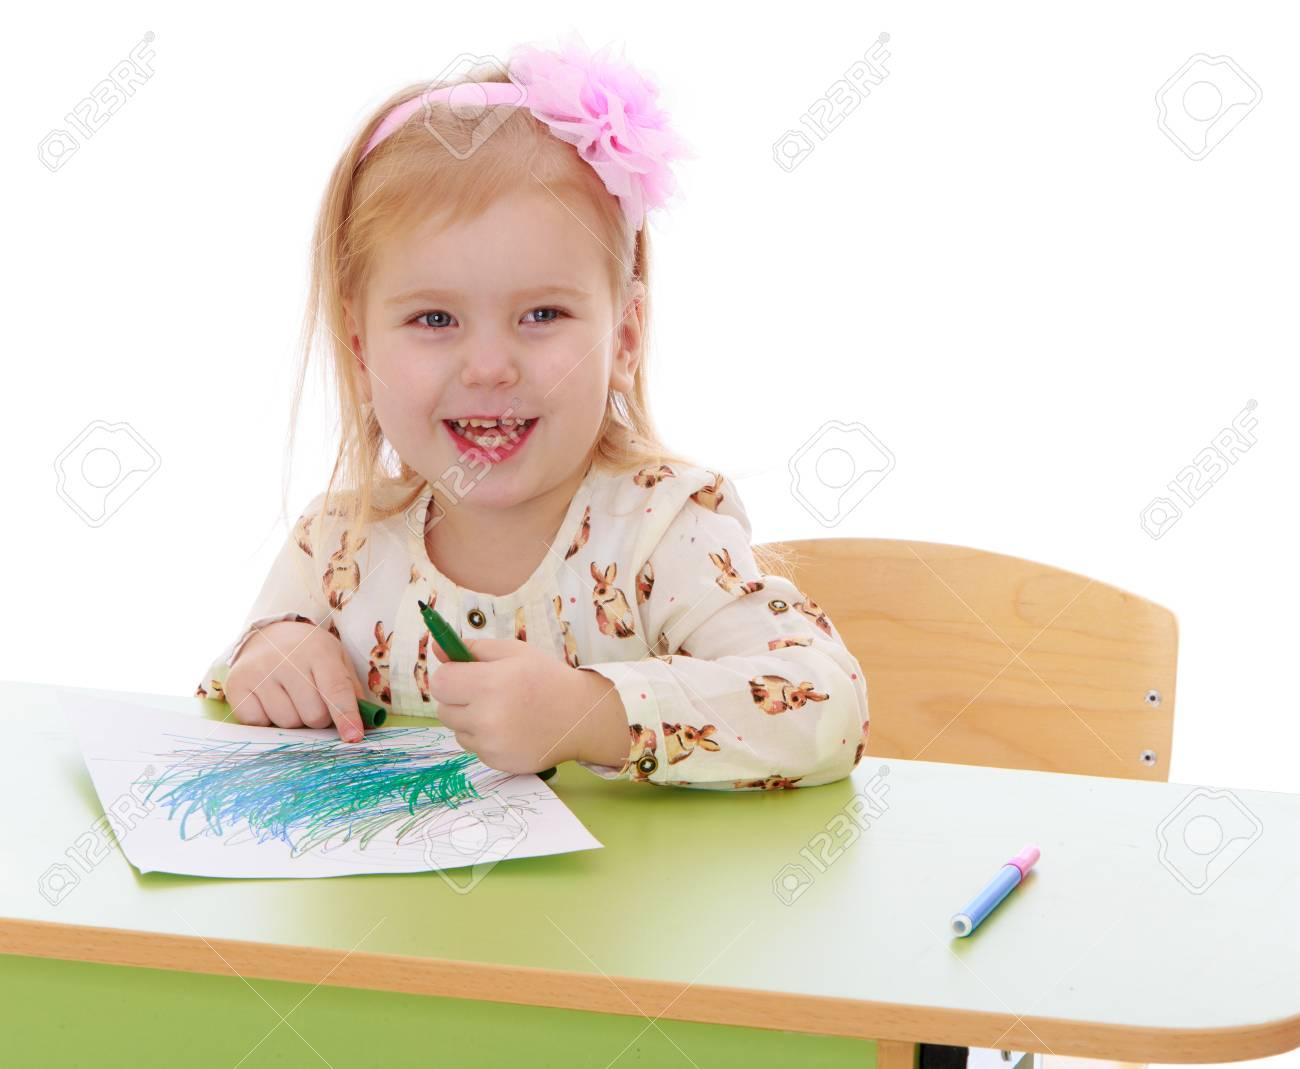 7ad32af2e4 Foto de archivo - Niña rubia caucásica dibuja con lápices sentado en la  mesa